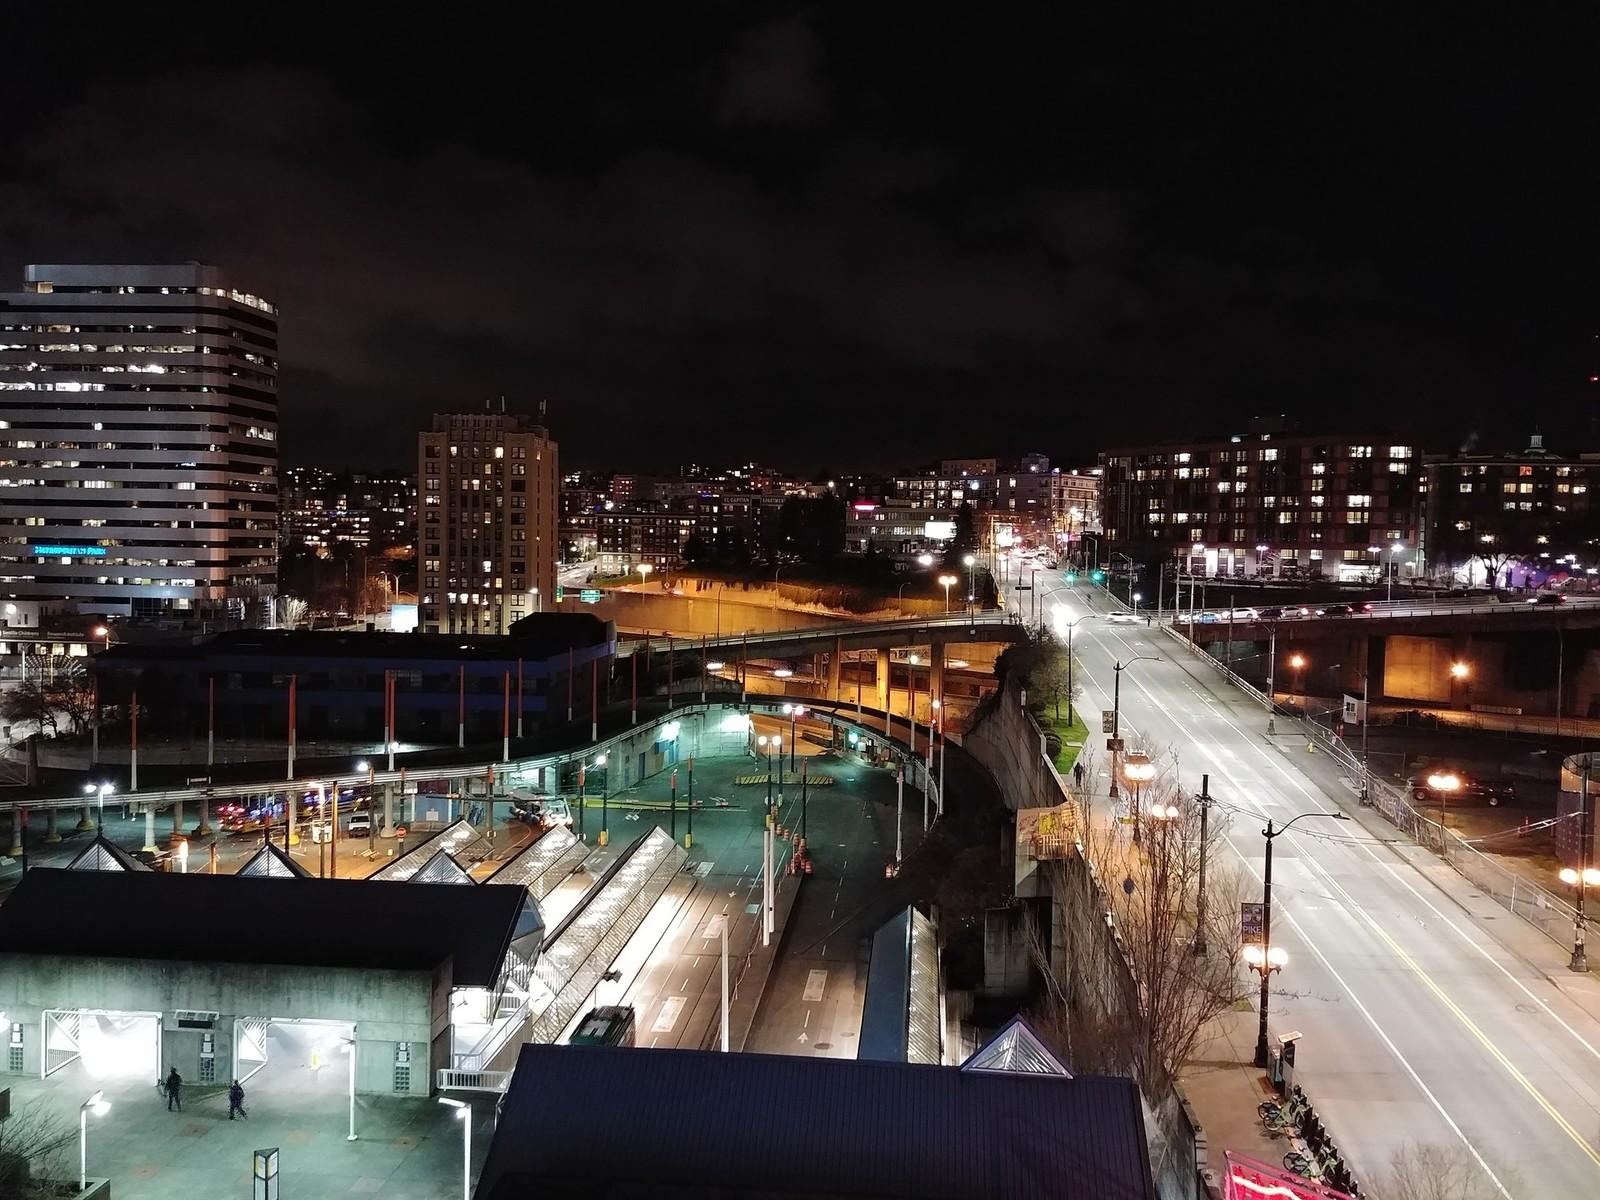 камера LG G6 ночь